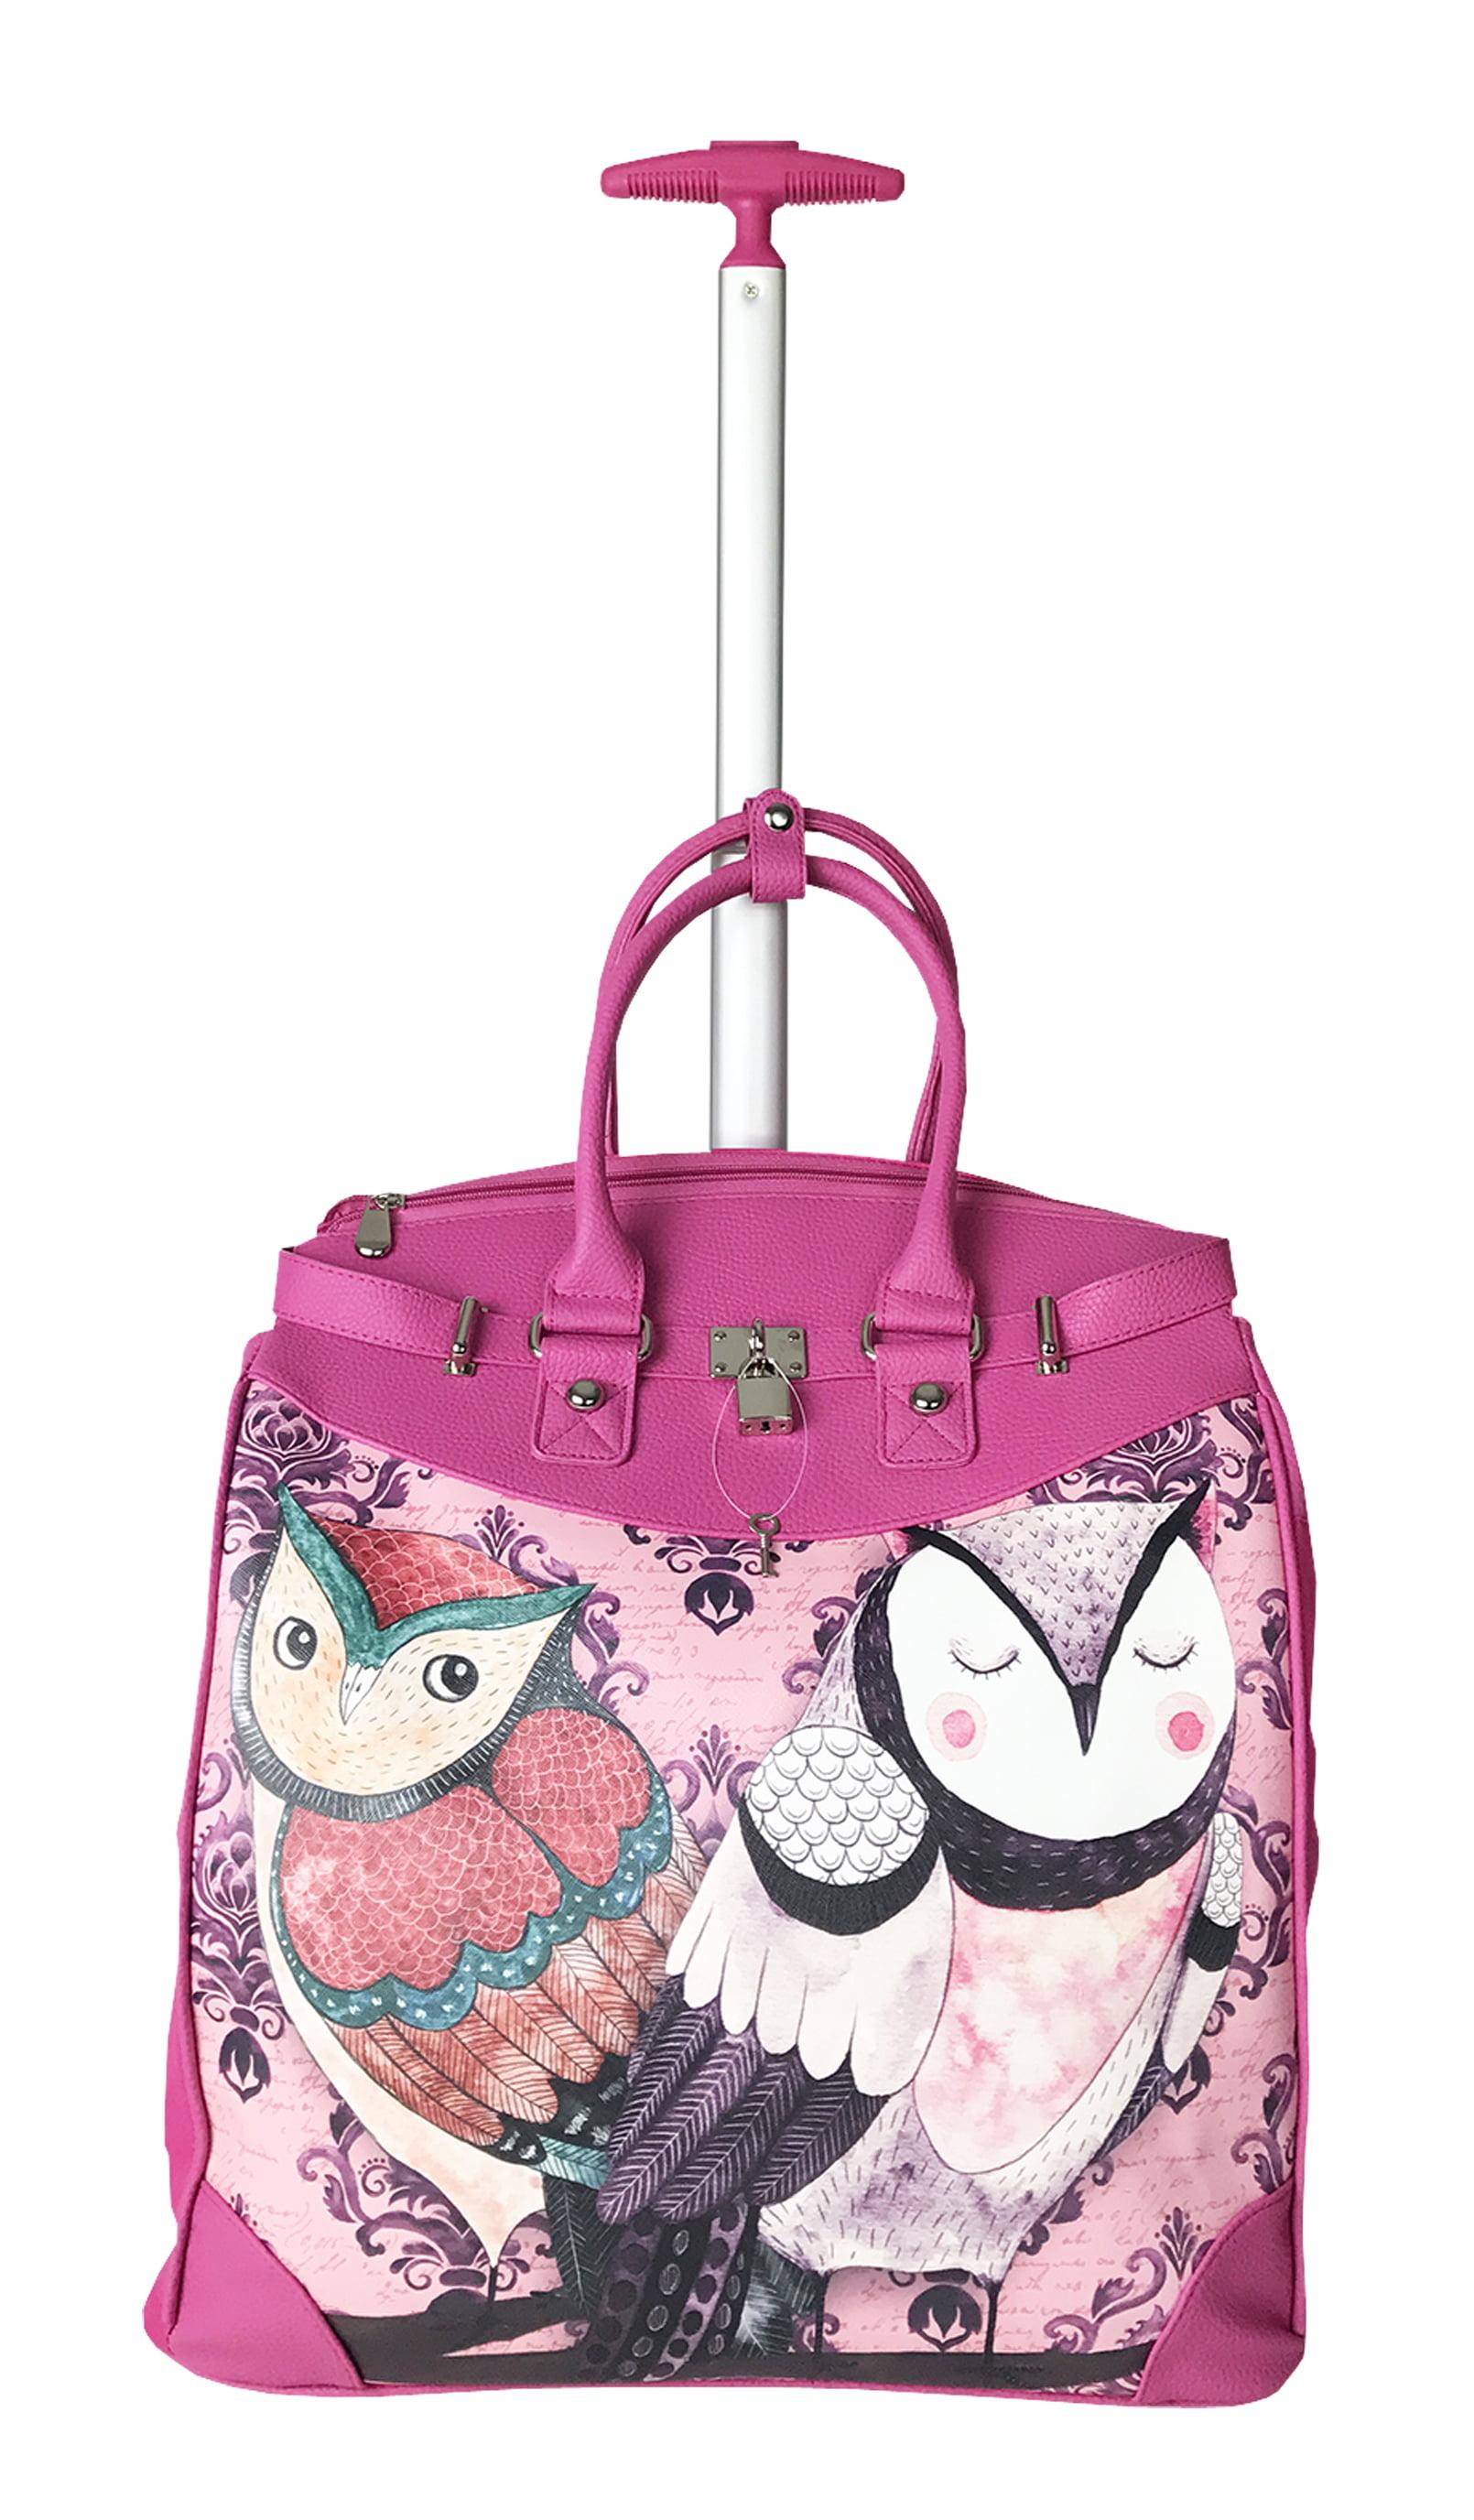 TrendyFlyer Computer Laptop Rolling Bag 2 Wheel Case Pink Owls by TrendyFlyer